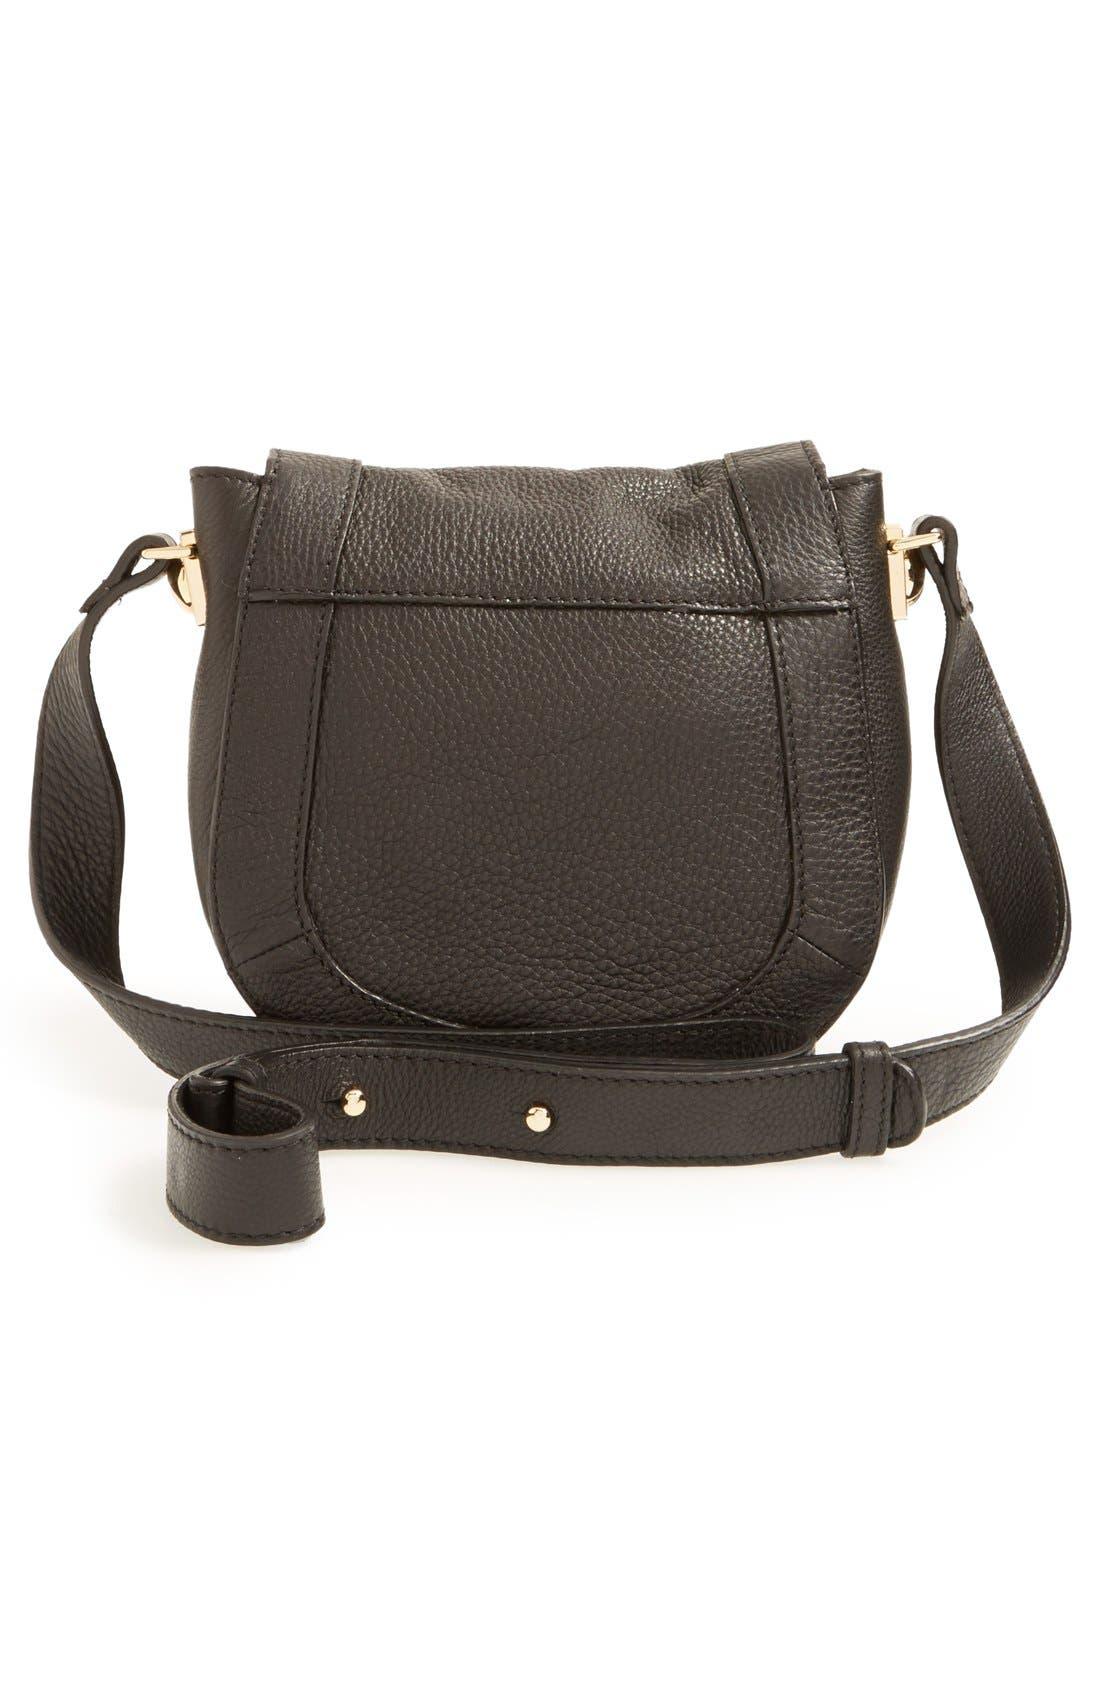 'Mini Sadie' Leather Crossbody Bag,                             Alternate thumbnail 6, color,                             001